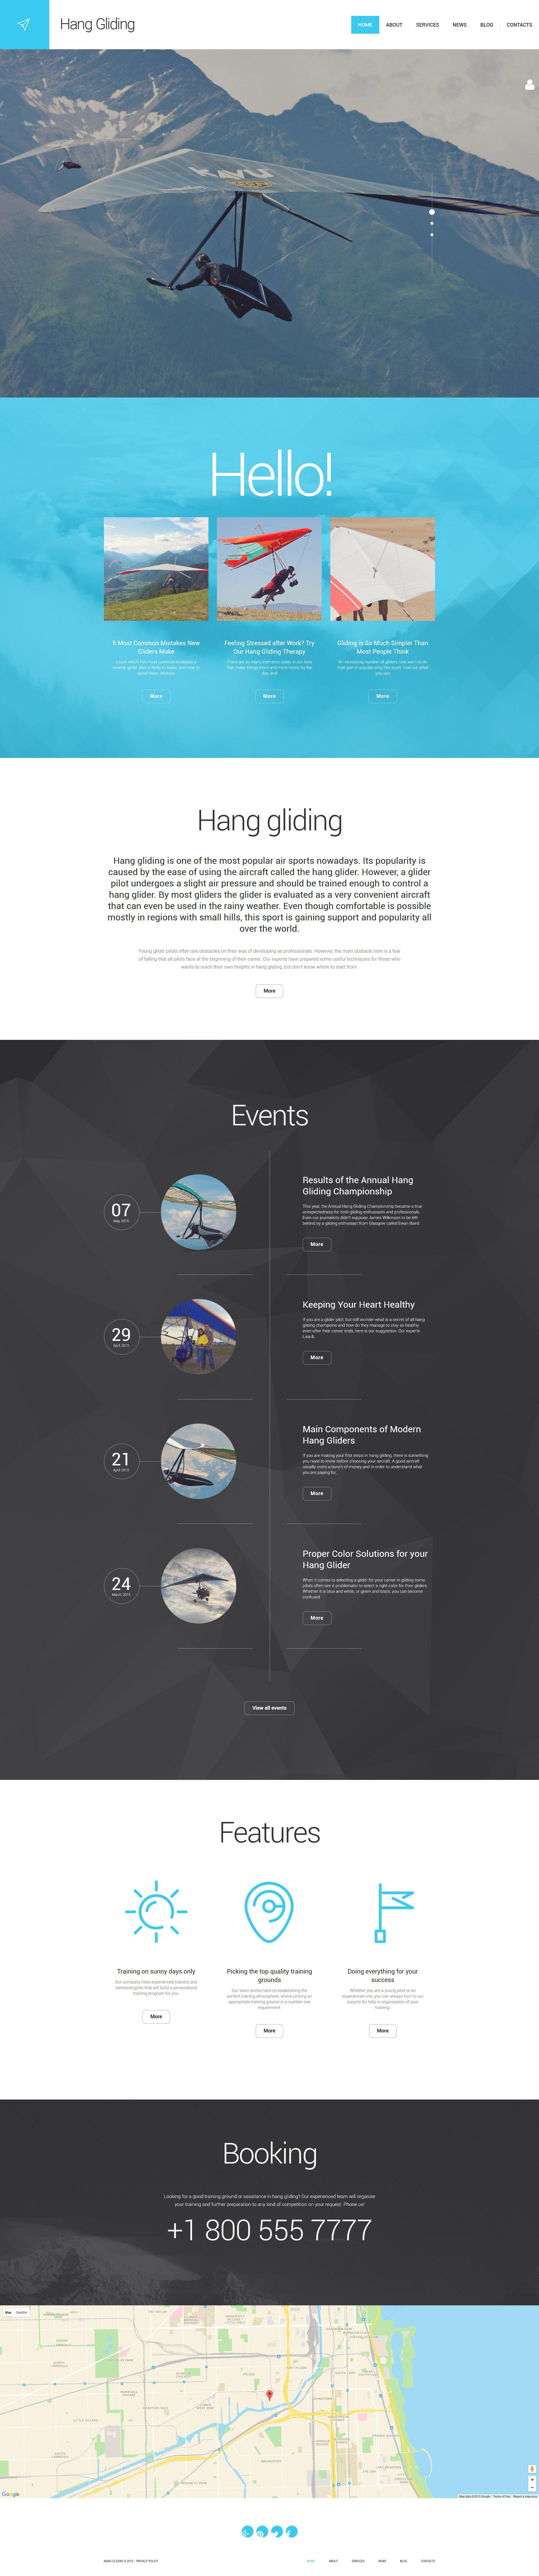 Hang Gliding WordPress Theme - screenshot